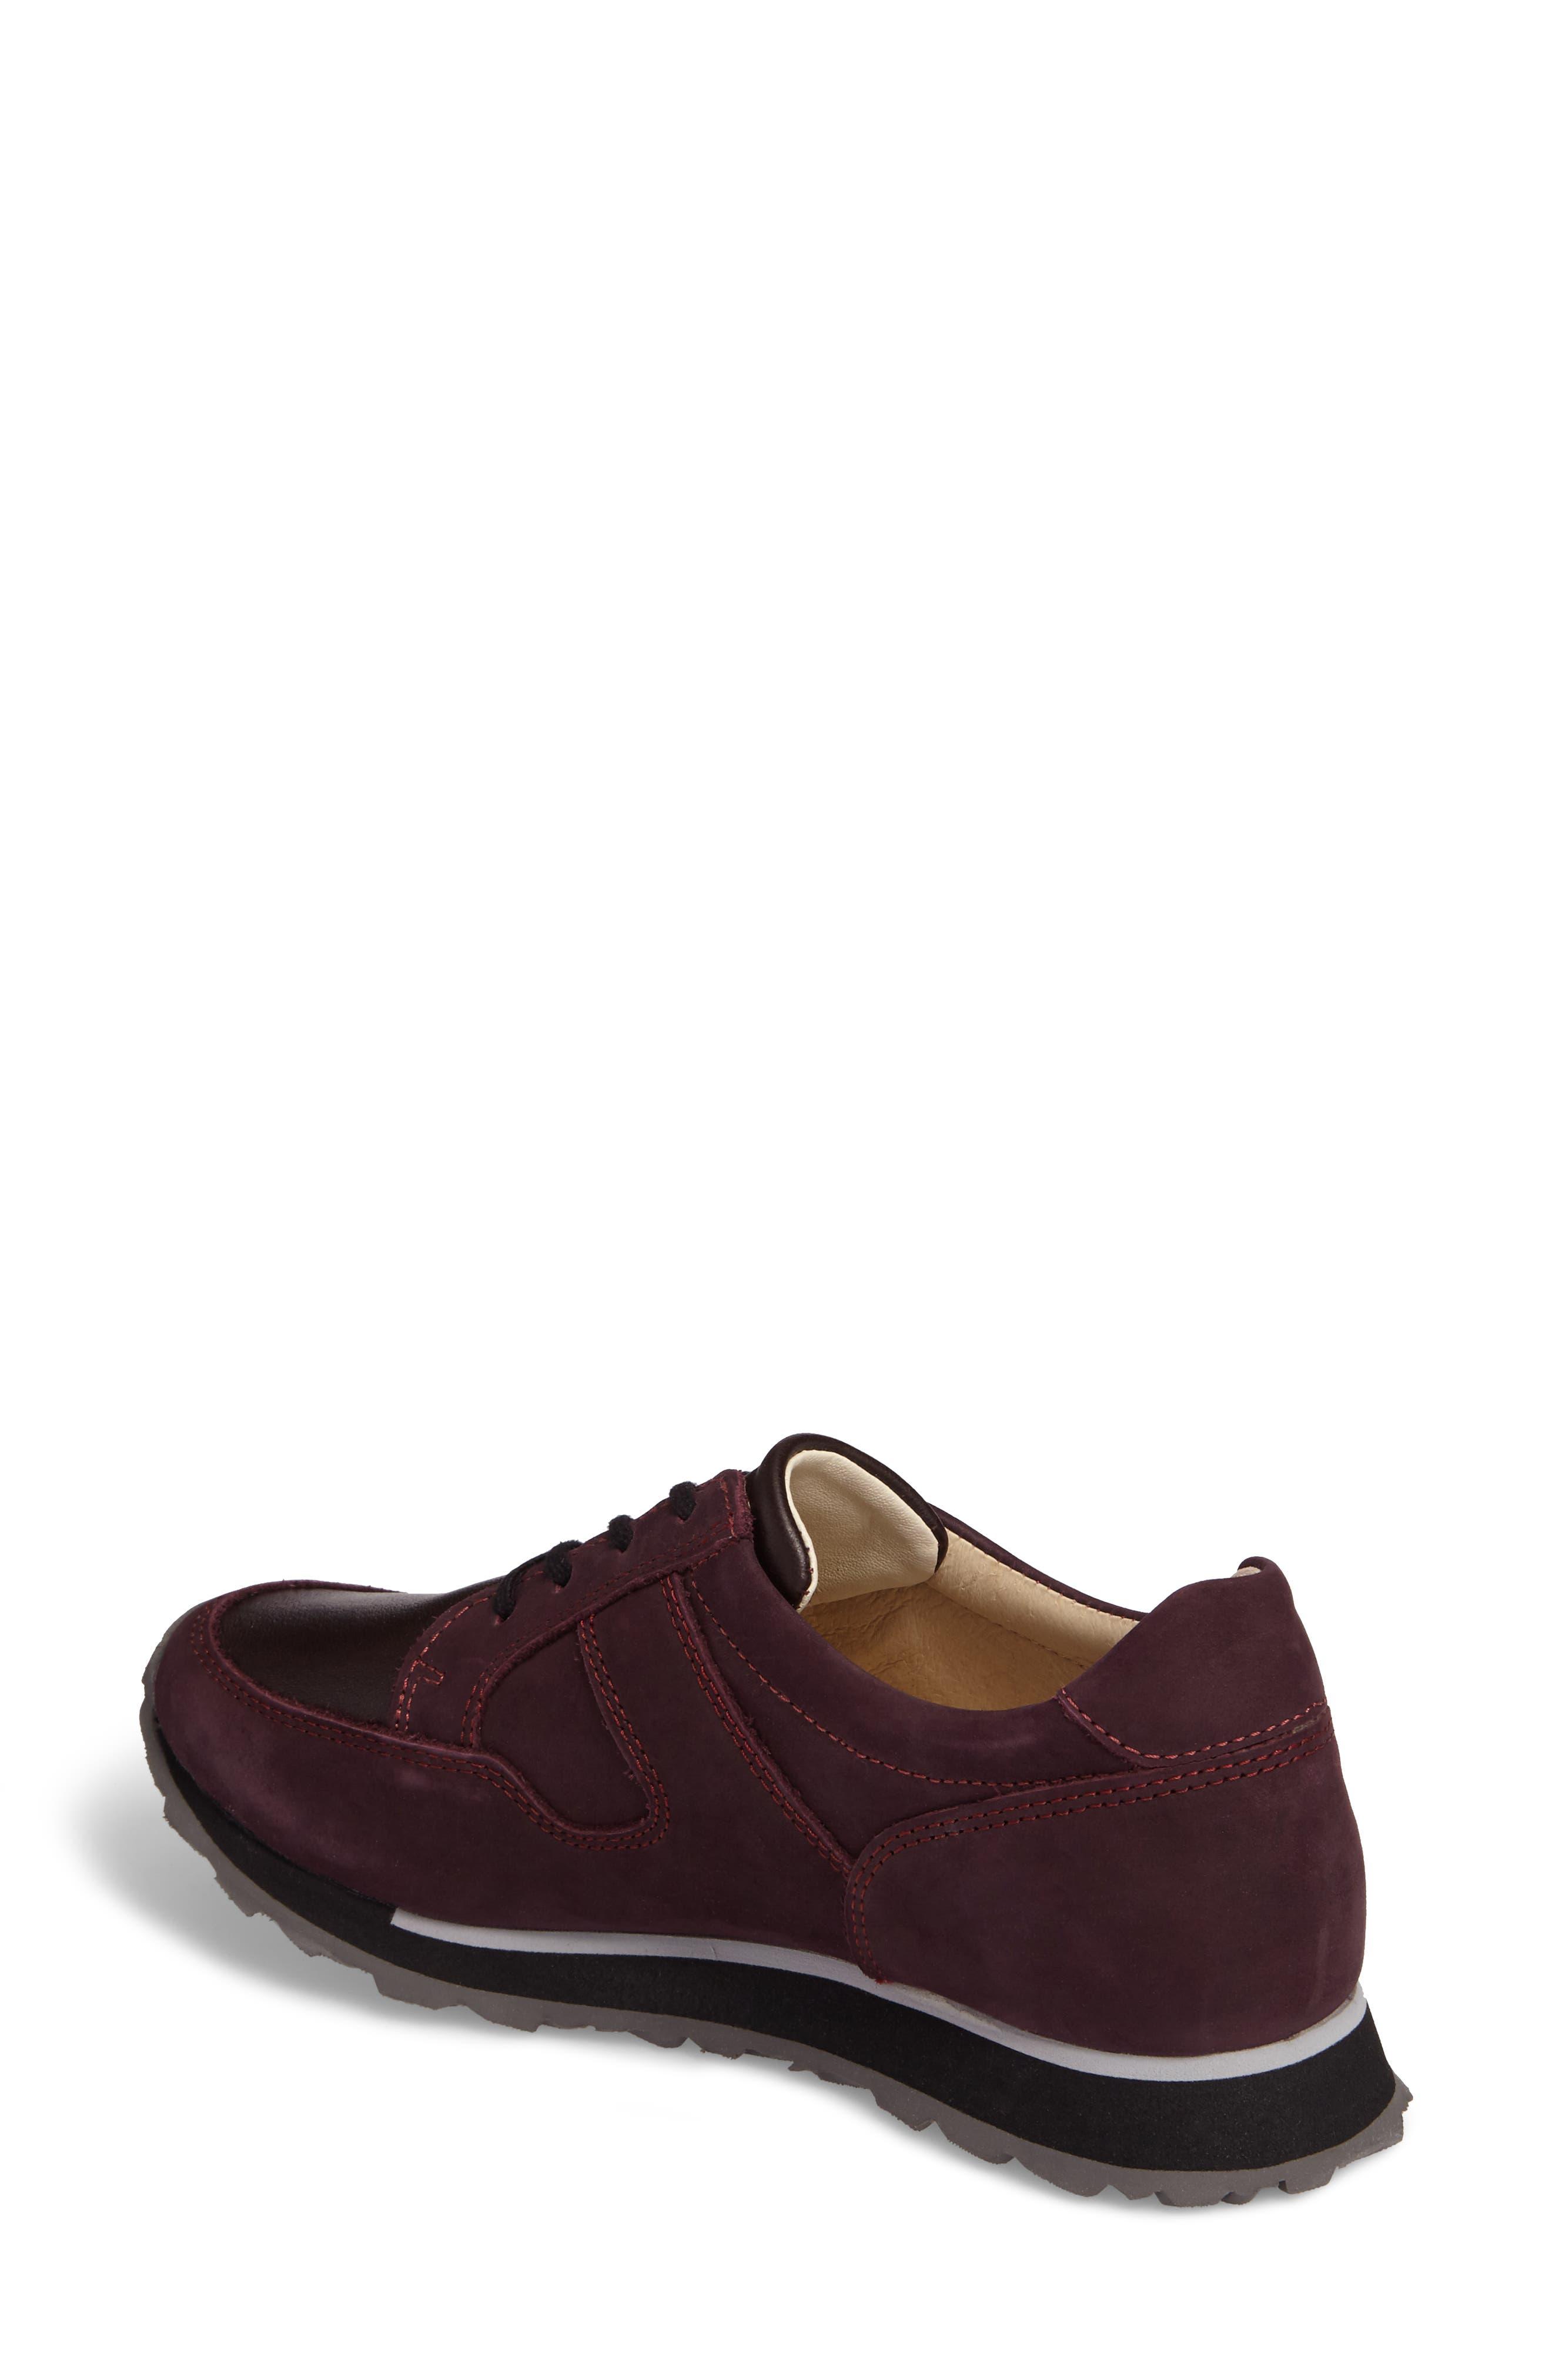 E-Walk Sneaker,                             Alternate thumbnail 2, color,                             BORDO LEATHER